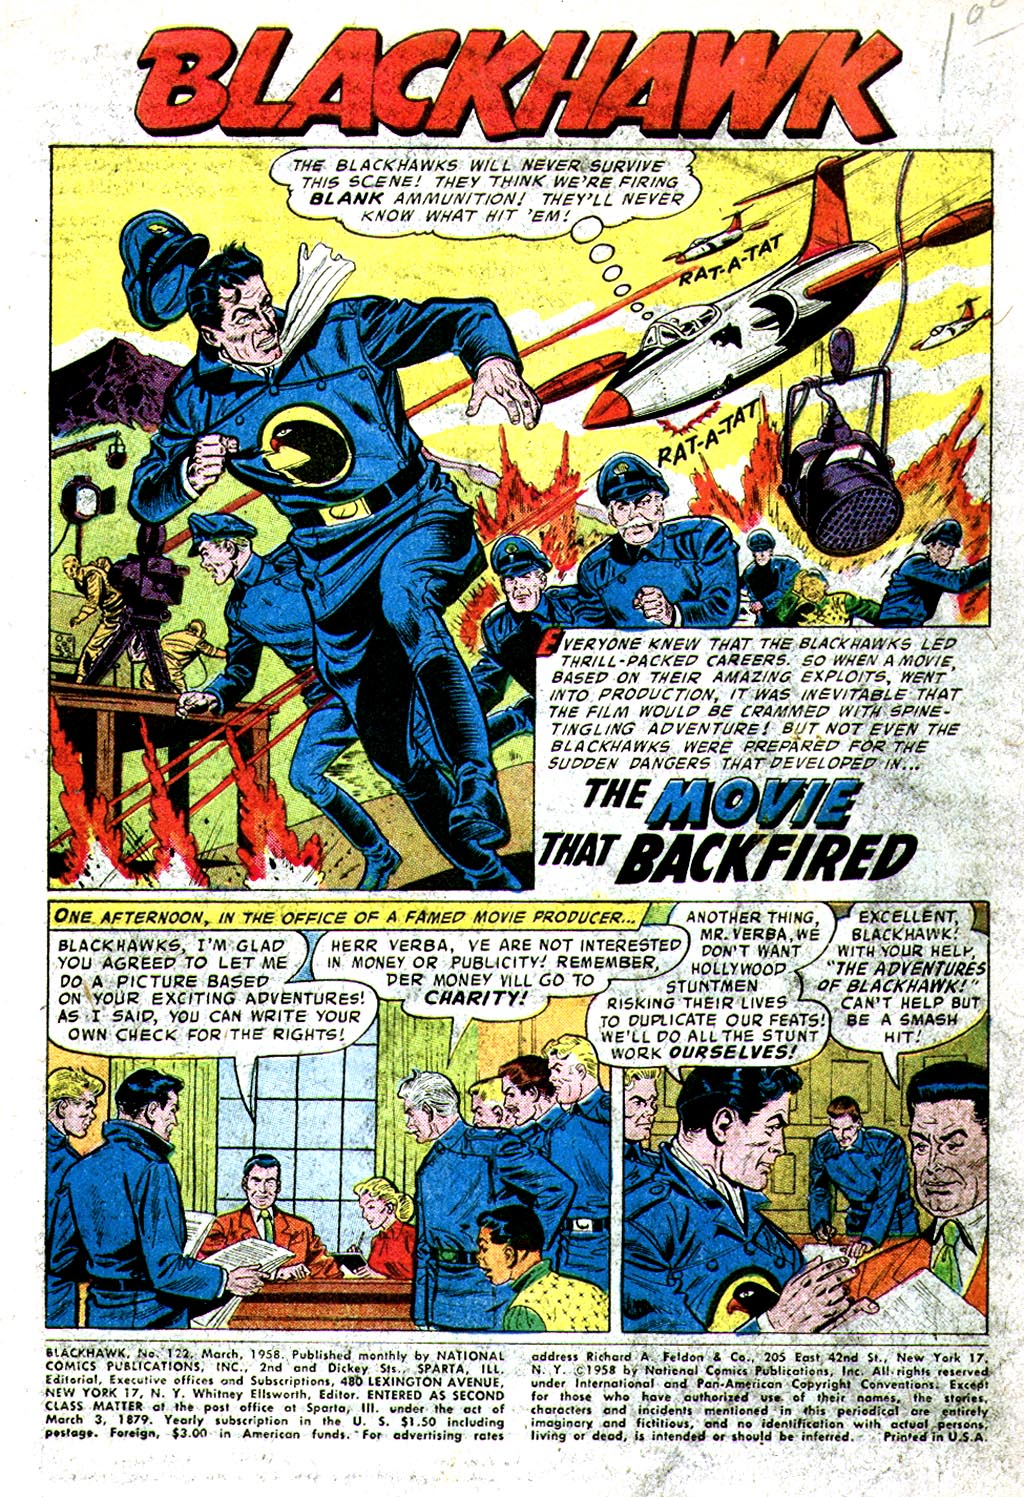 Blackhawk v1 122 | Viewcomic reading comics online for free 2019